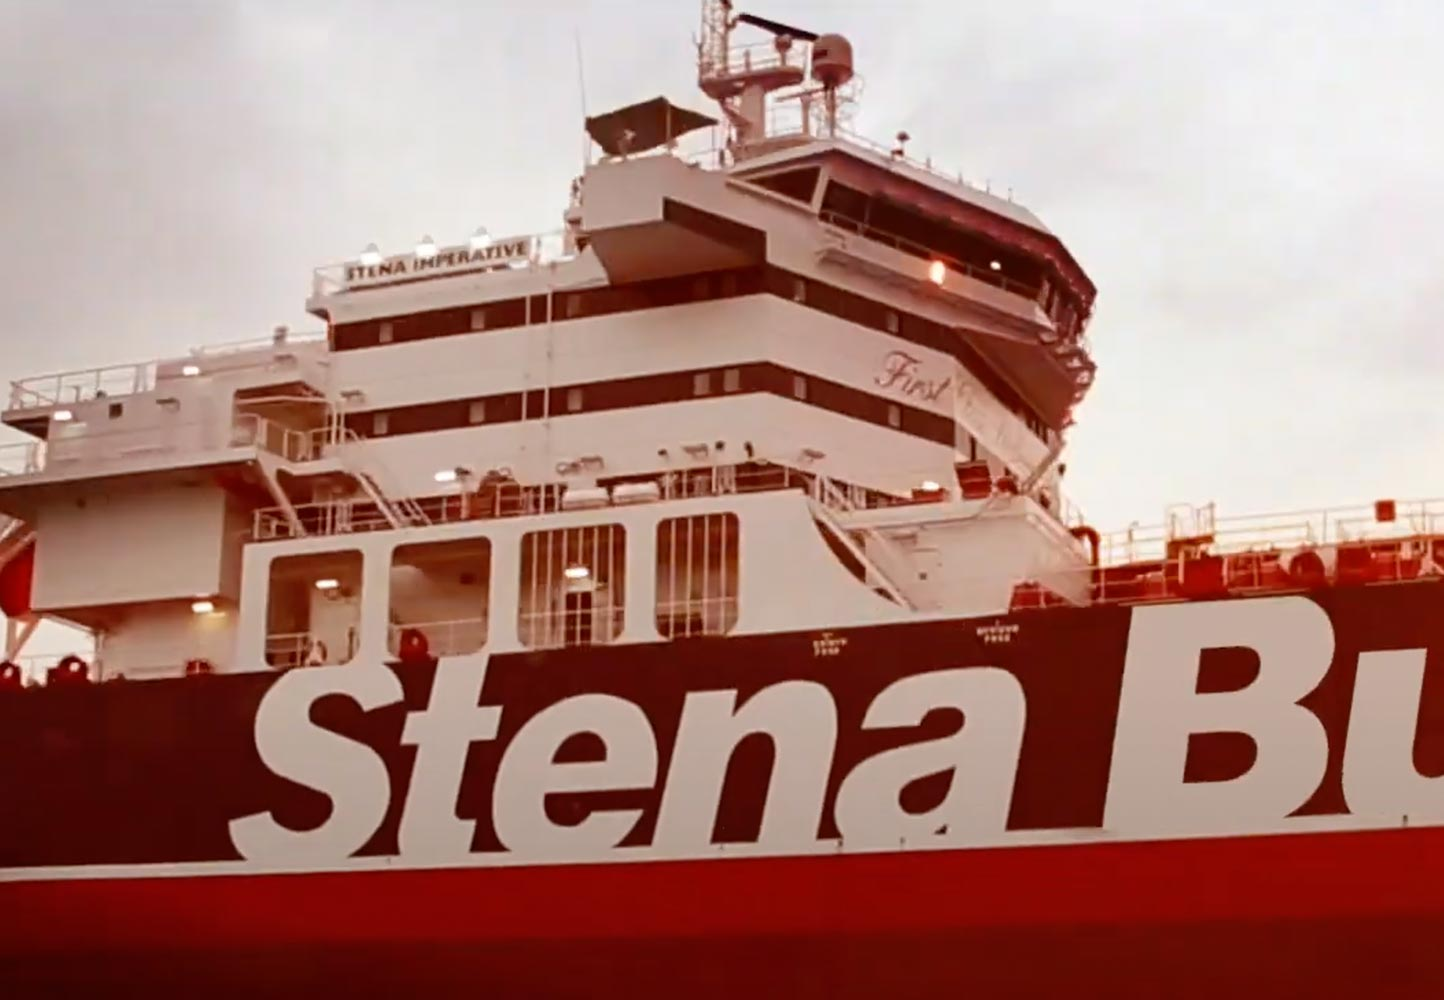 Stena bulk vessel